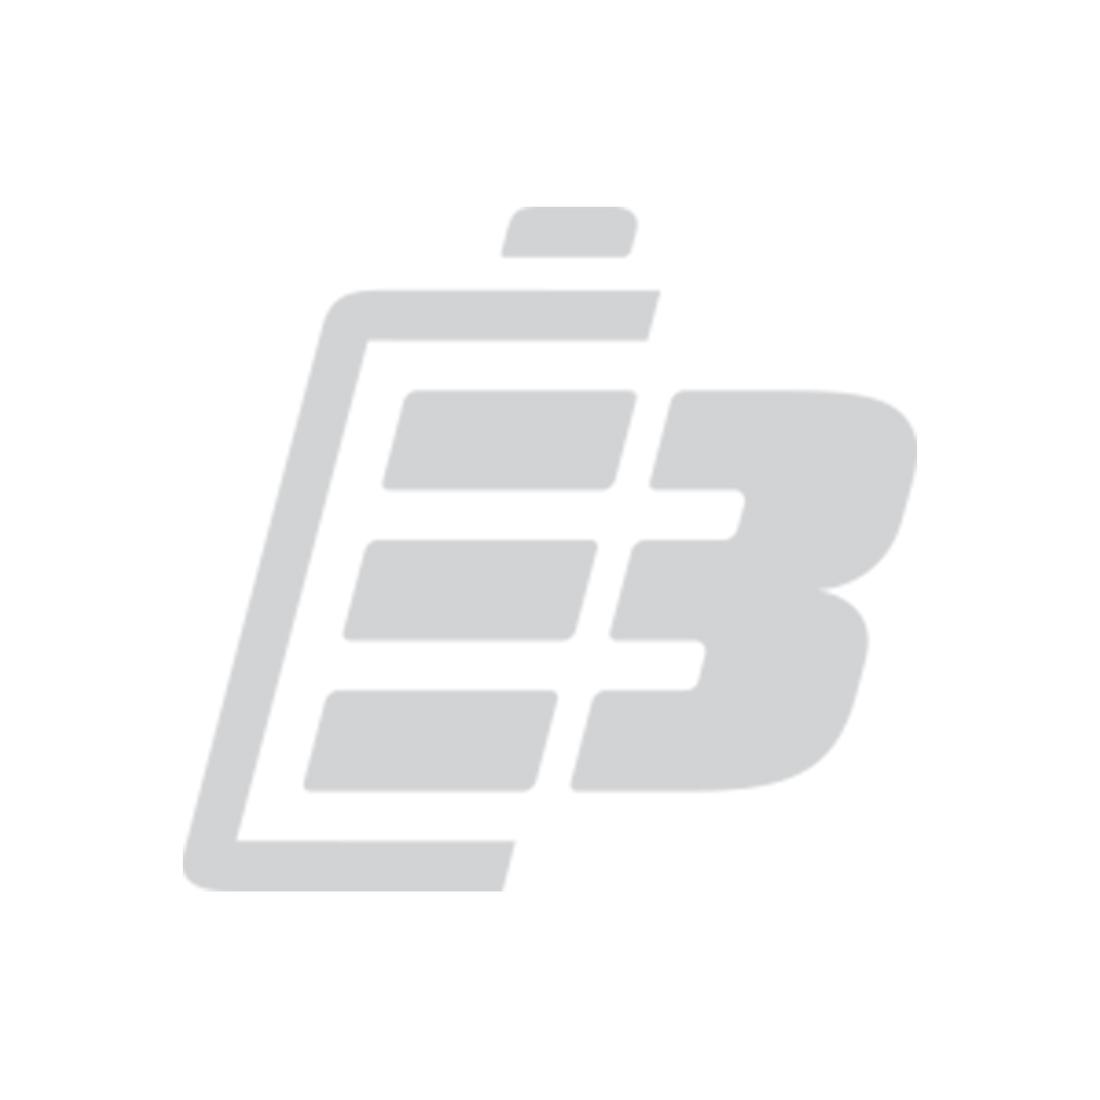 Cordless phone battery Panasonic HHR-P101E_1